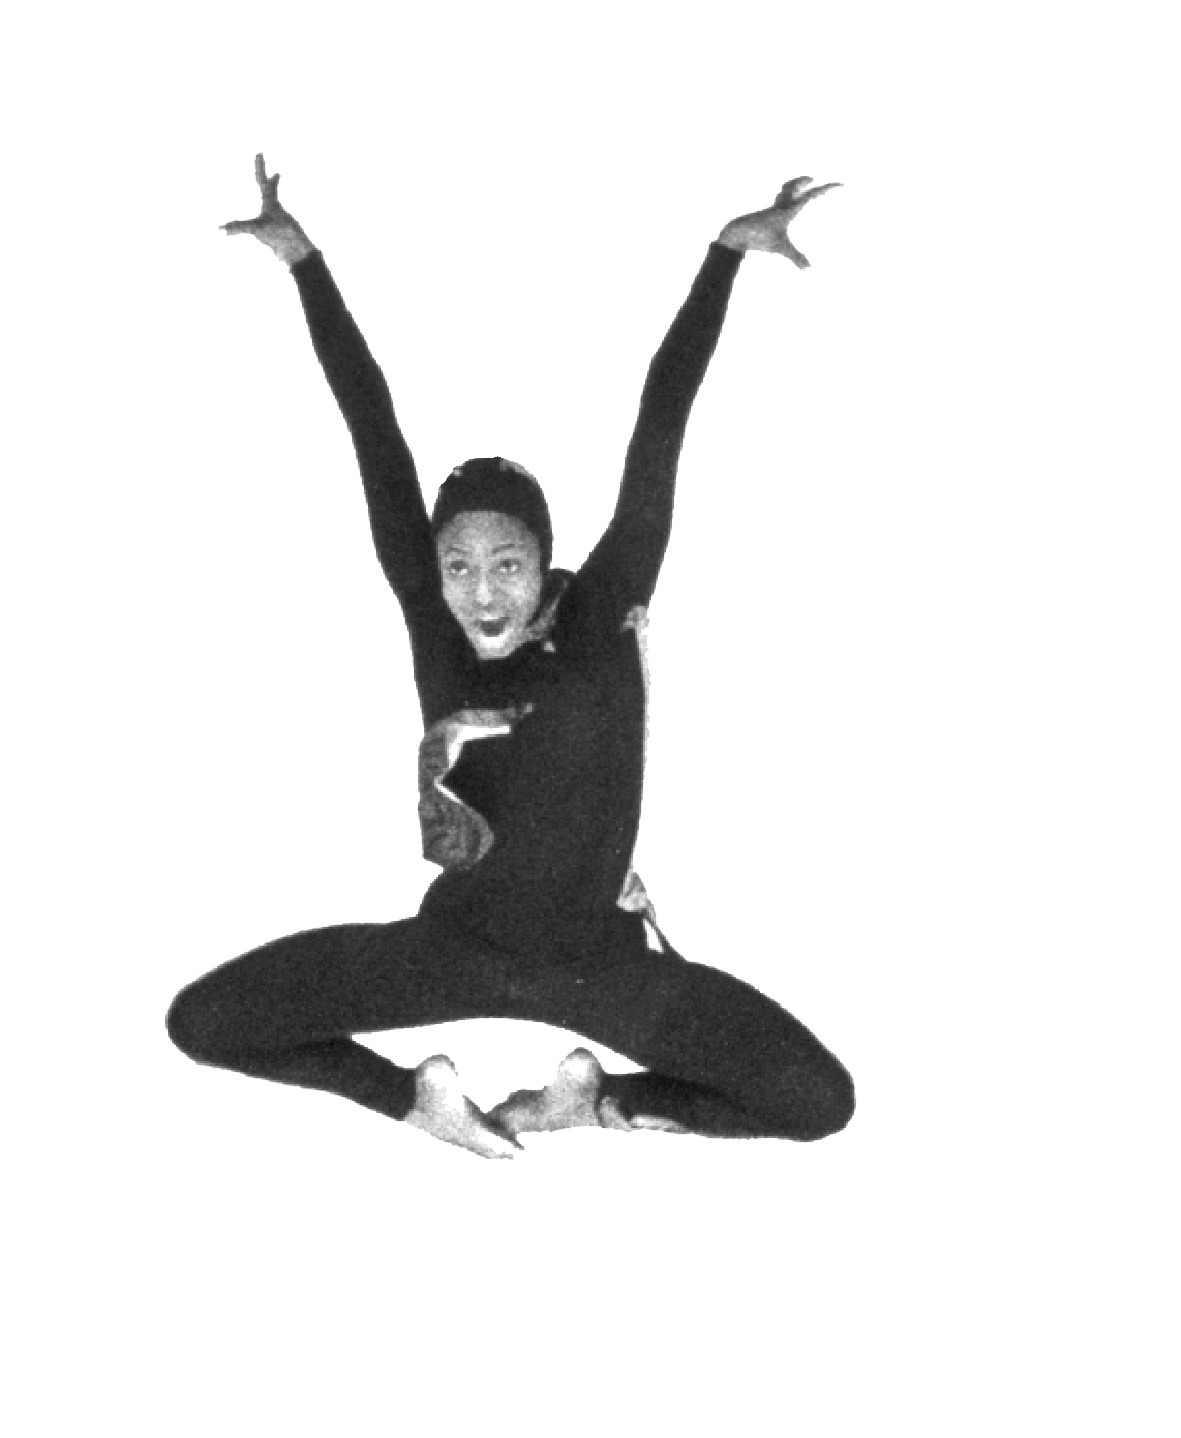 danse cie academie danse et cie n mes 30900. Black Bedroom Furniture Sets. Home Design Ideas